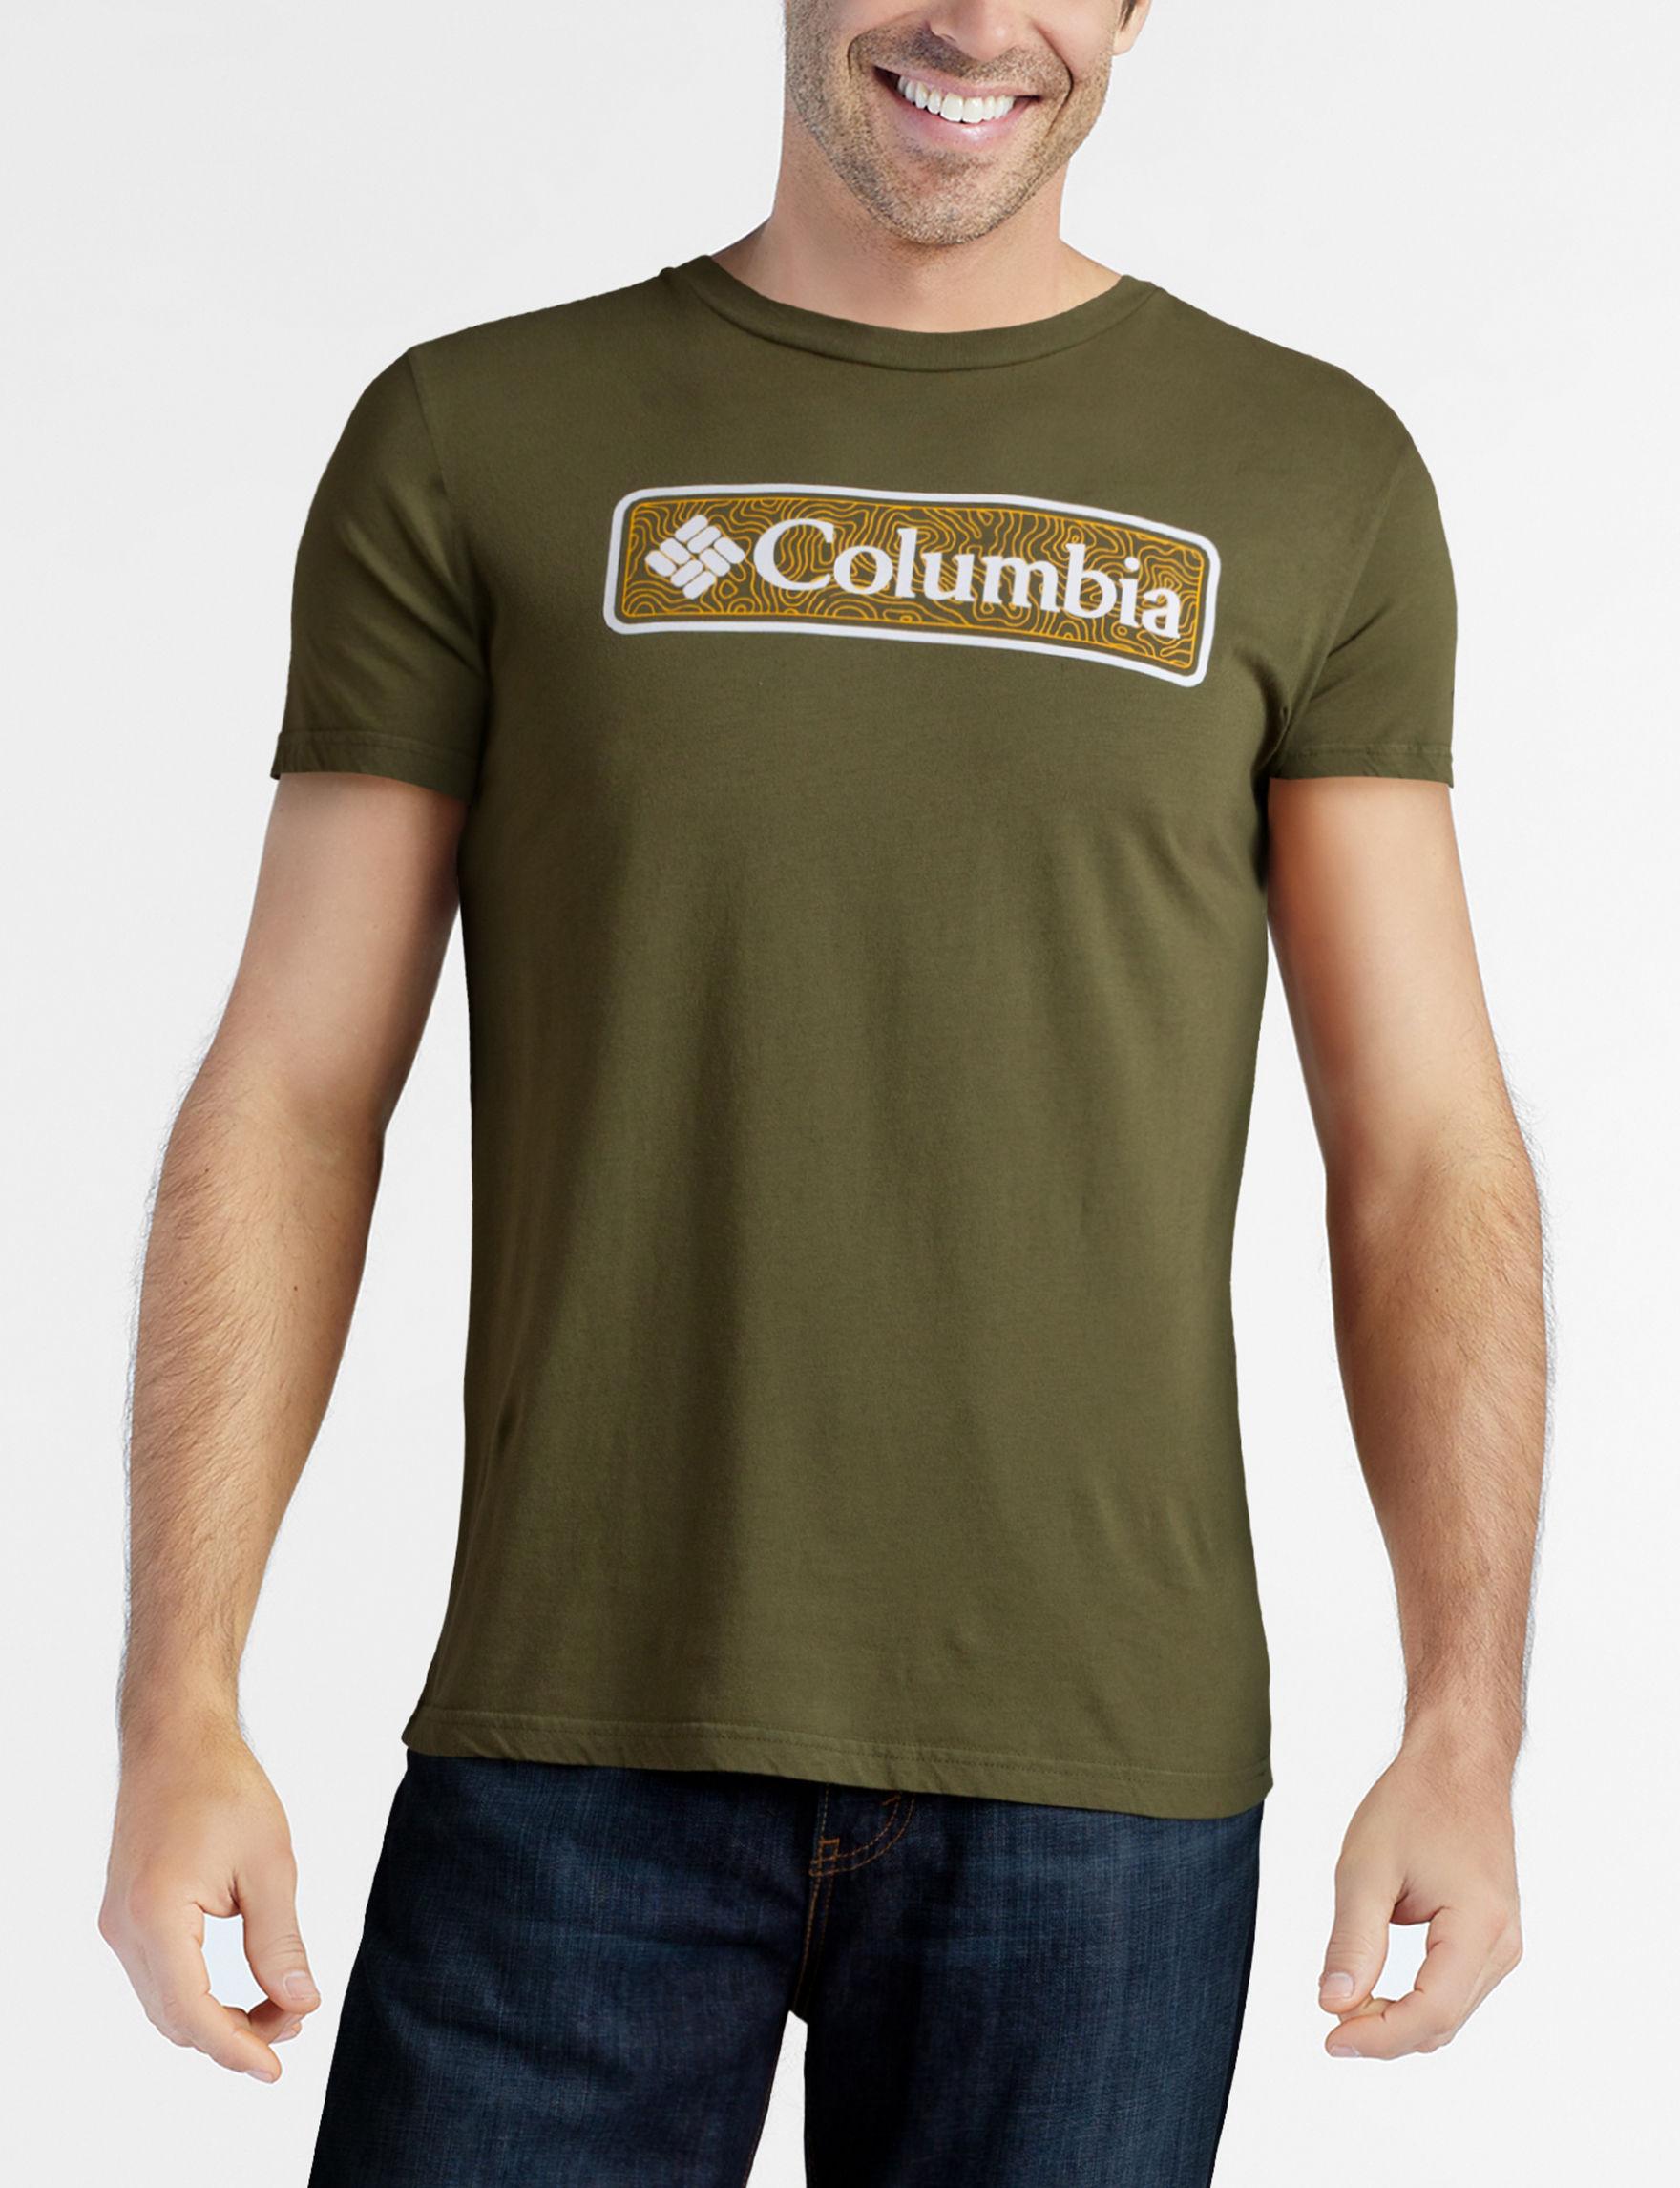 Columbia Green Tees & Tanks